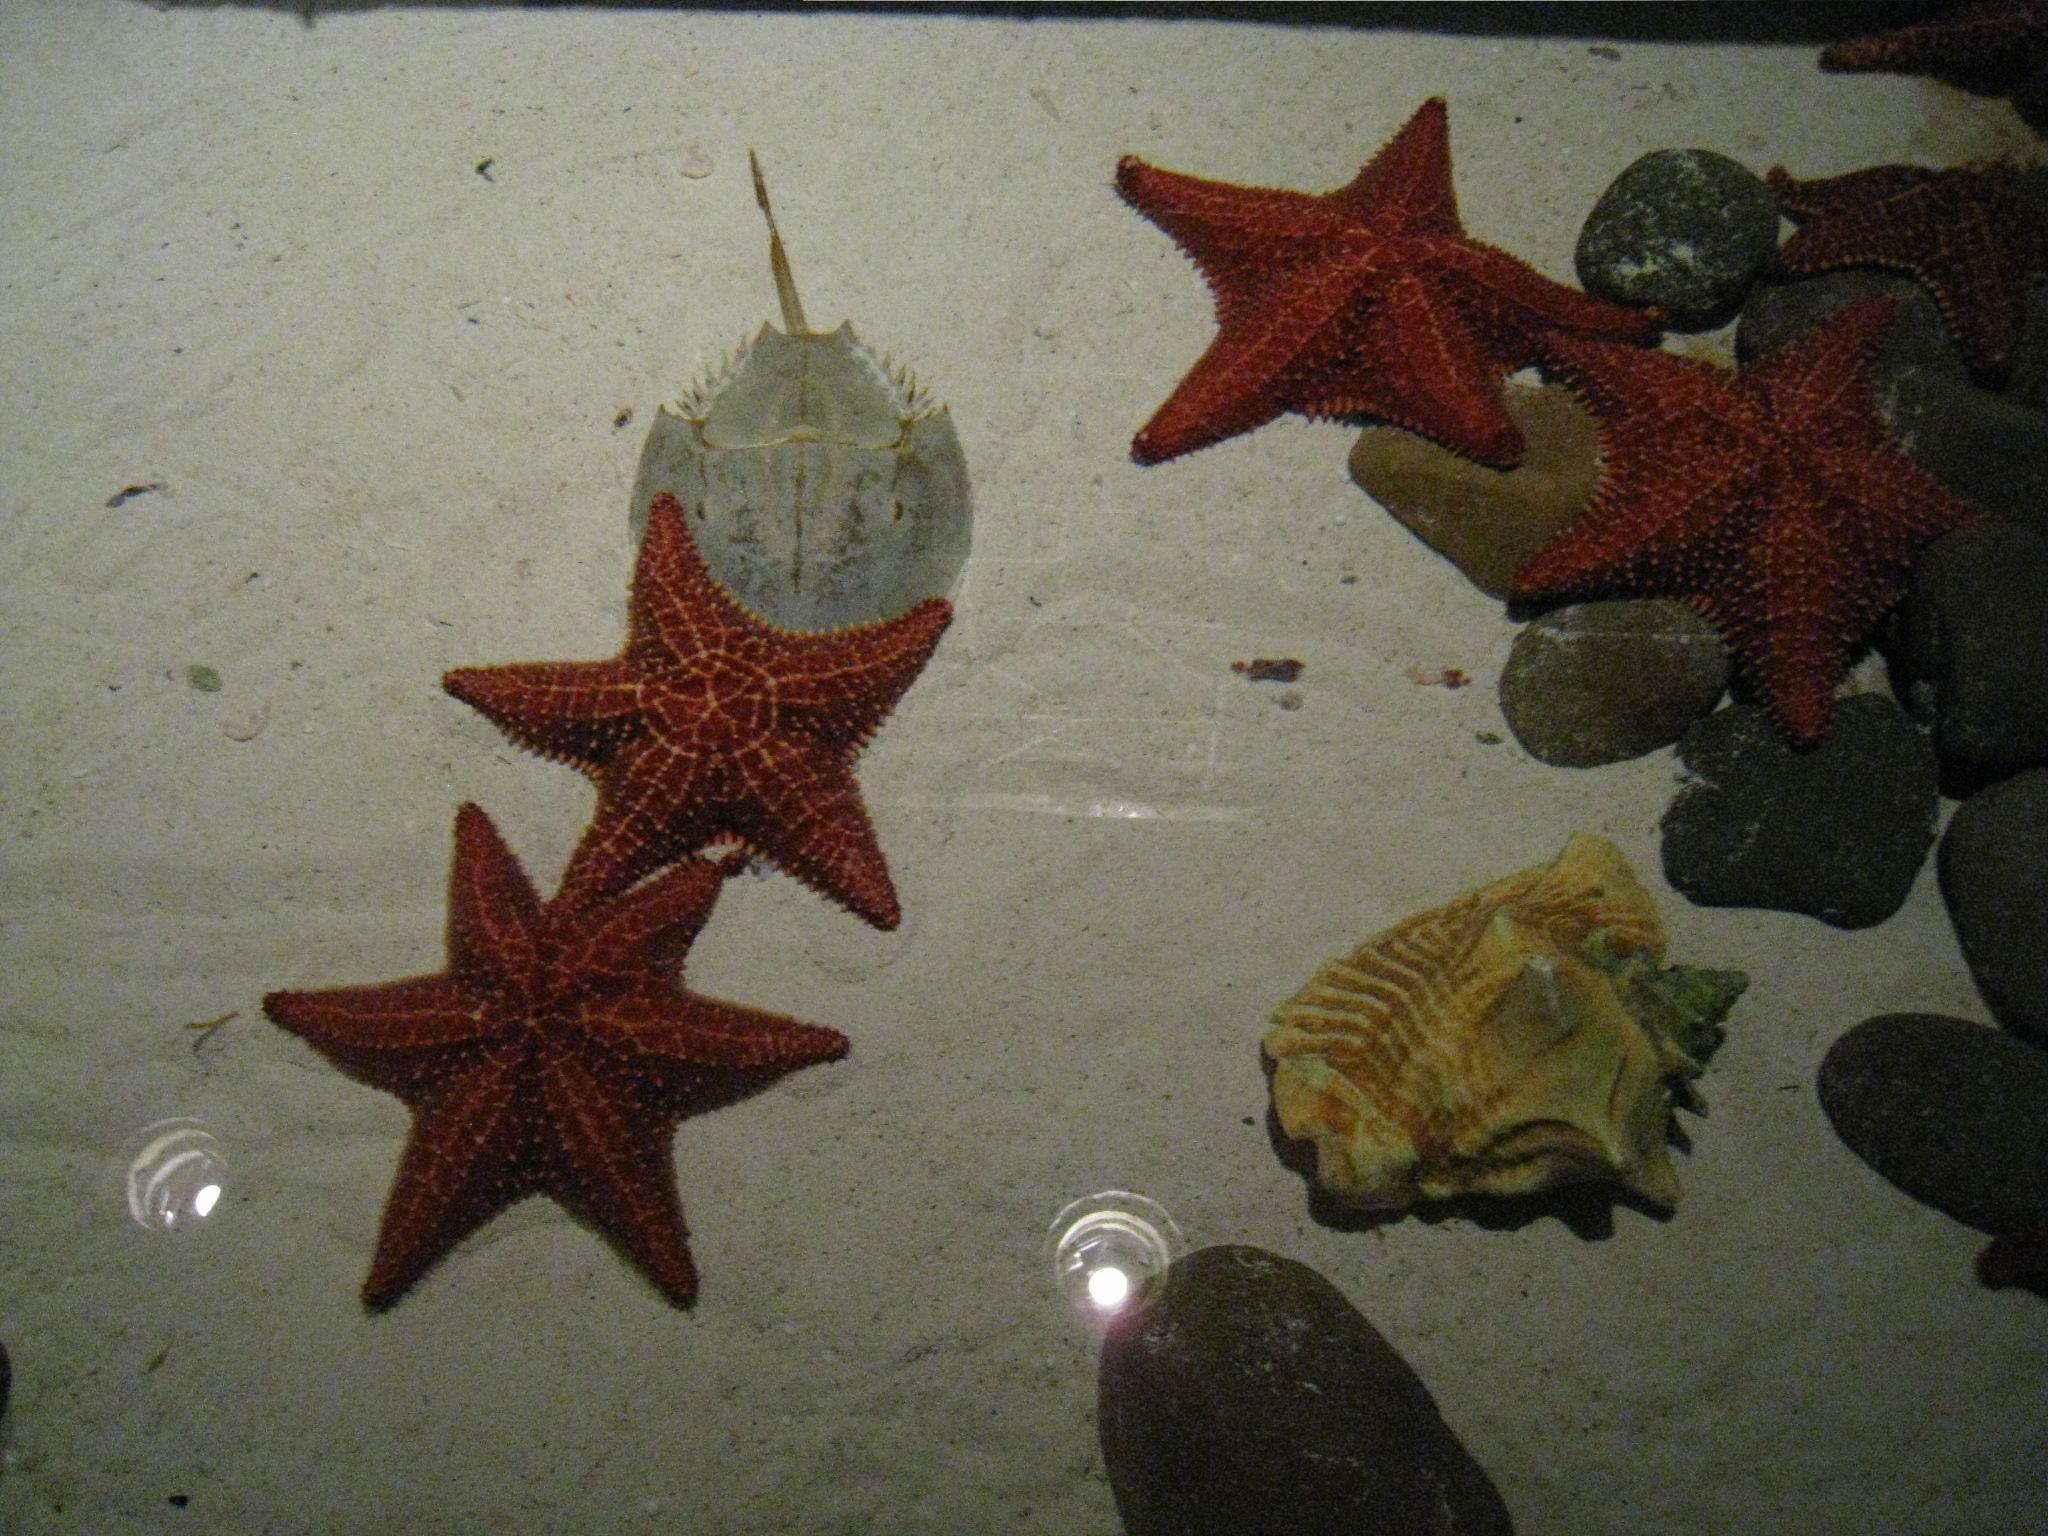 star fish, horse shoe crab